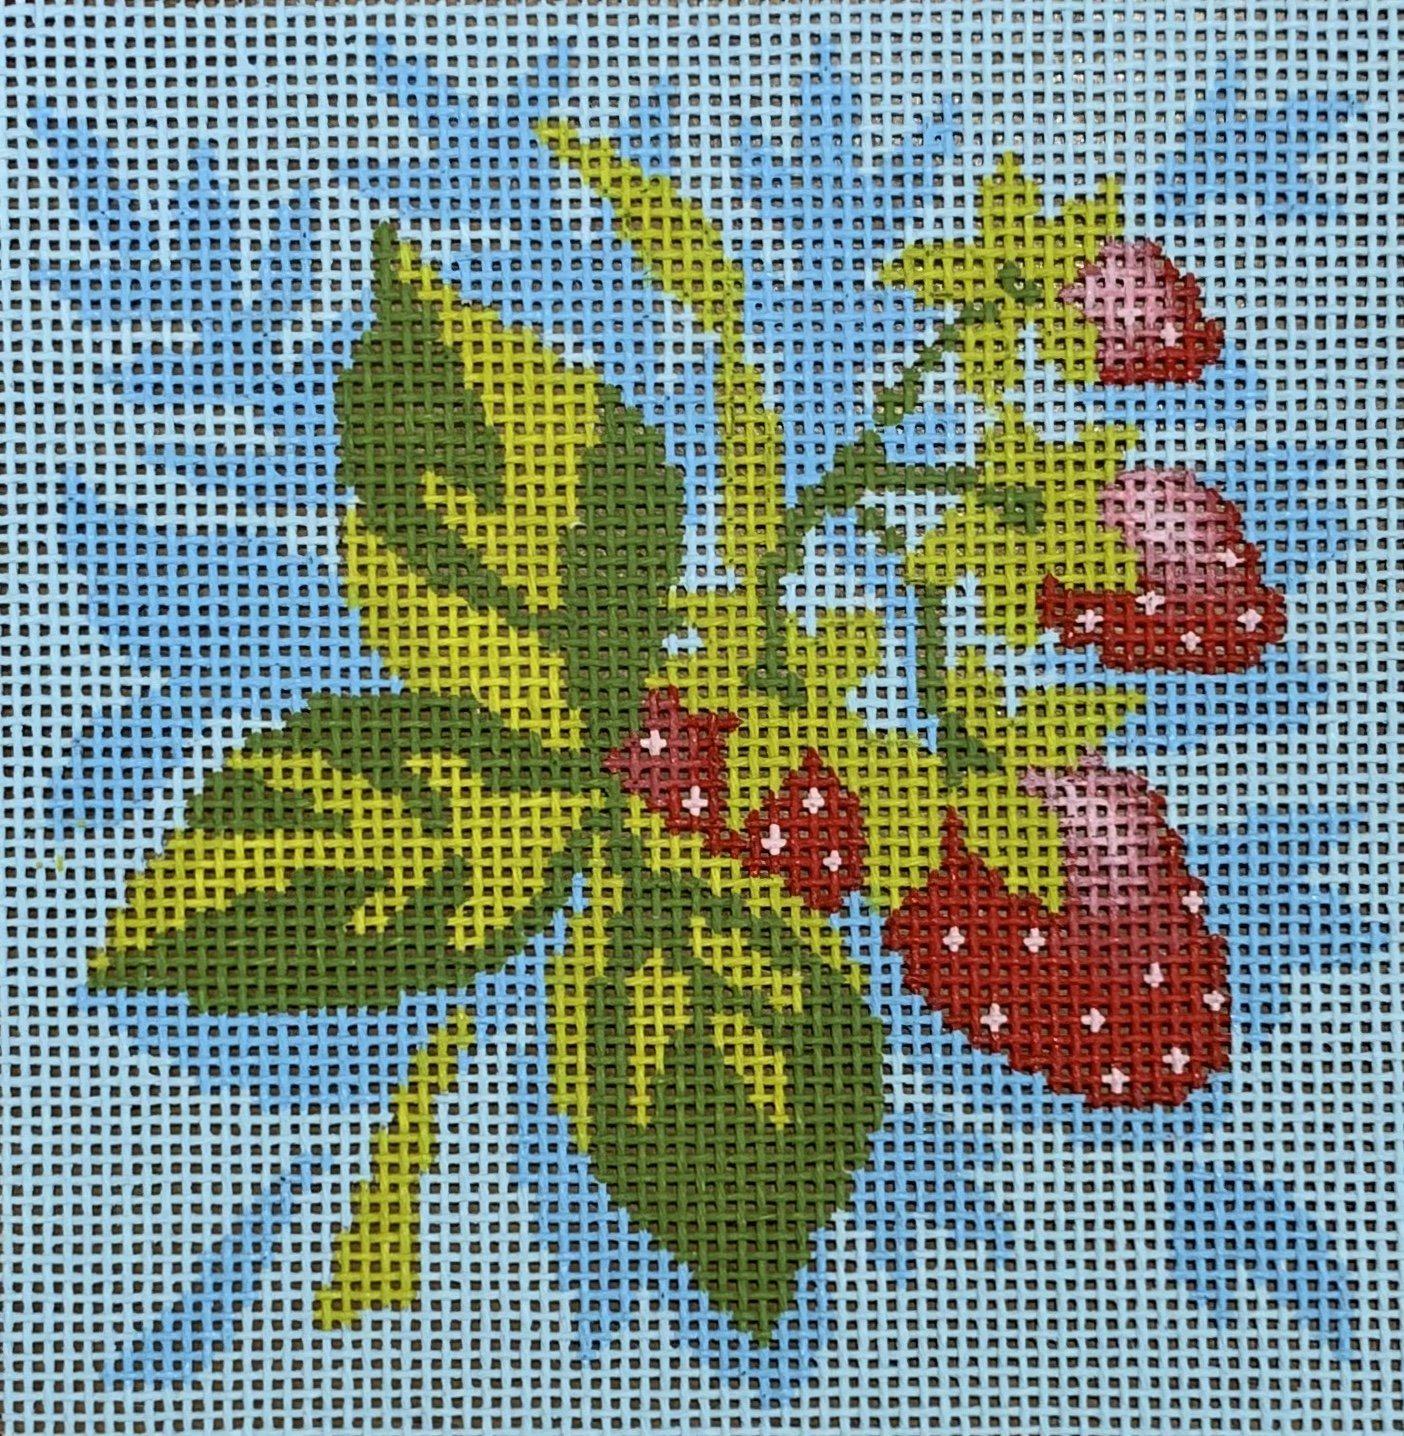 Fruit Square - Strawberries